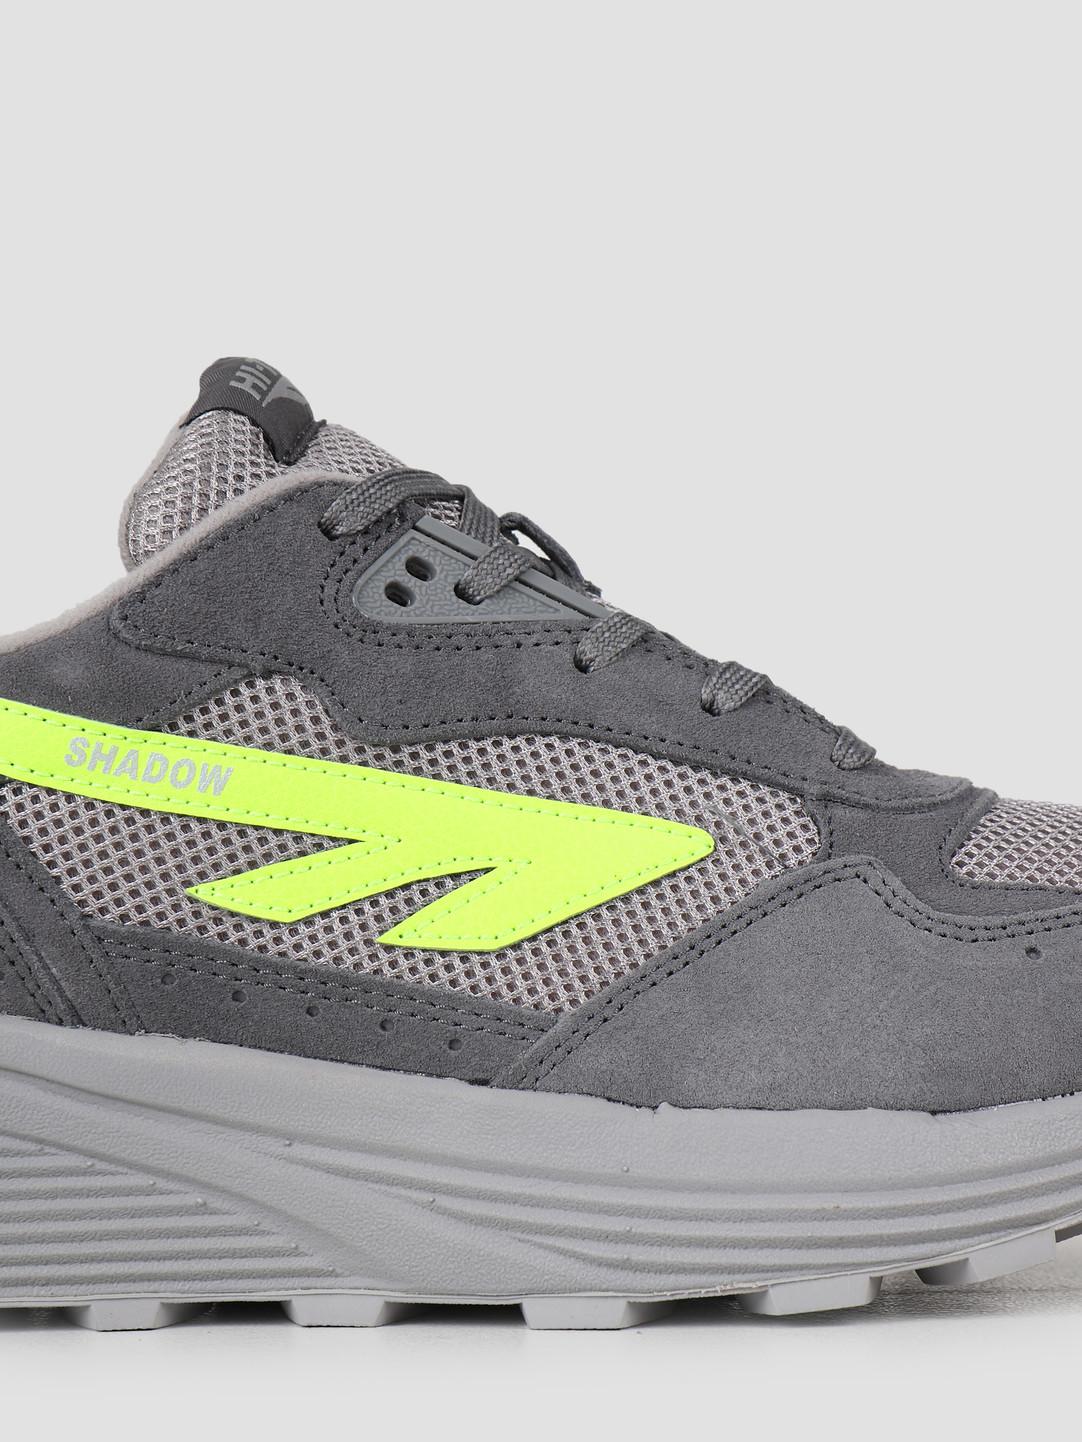 Hi-Tec Hi-Tec HTS Silver Shadow RGS Grey Neon Yellow K010002-051